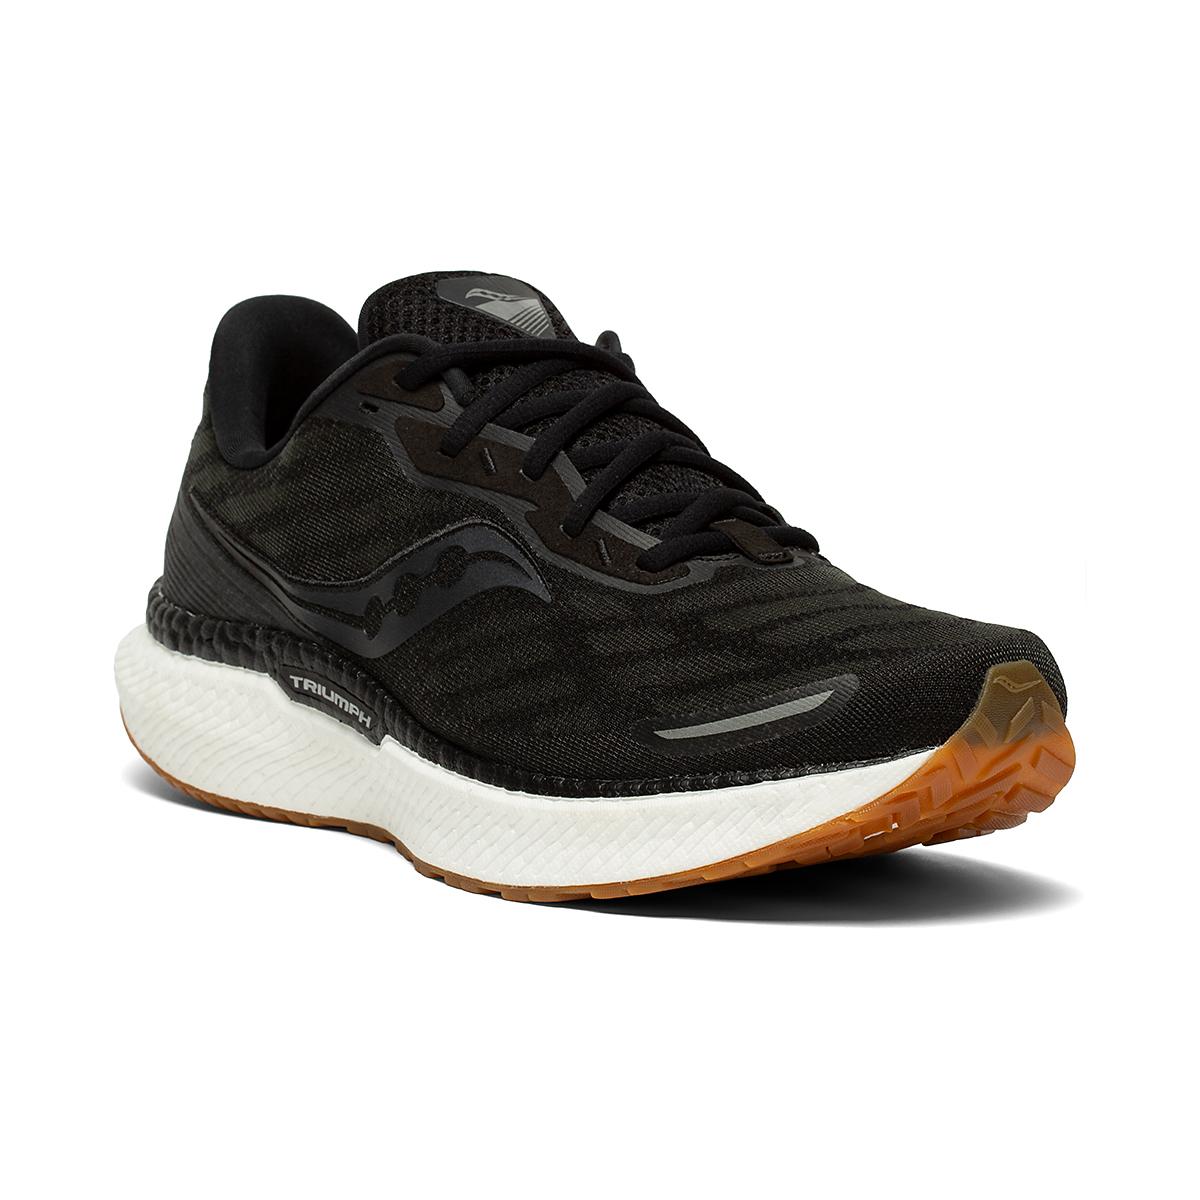 Men's Saucony Triumph 19 Running Shoe - Color: Black/Gum - Size: 7 - Width: Regular, Black/Gum, large, image 2